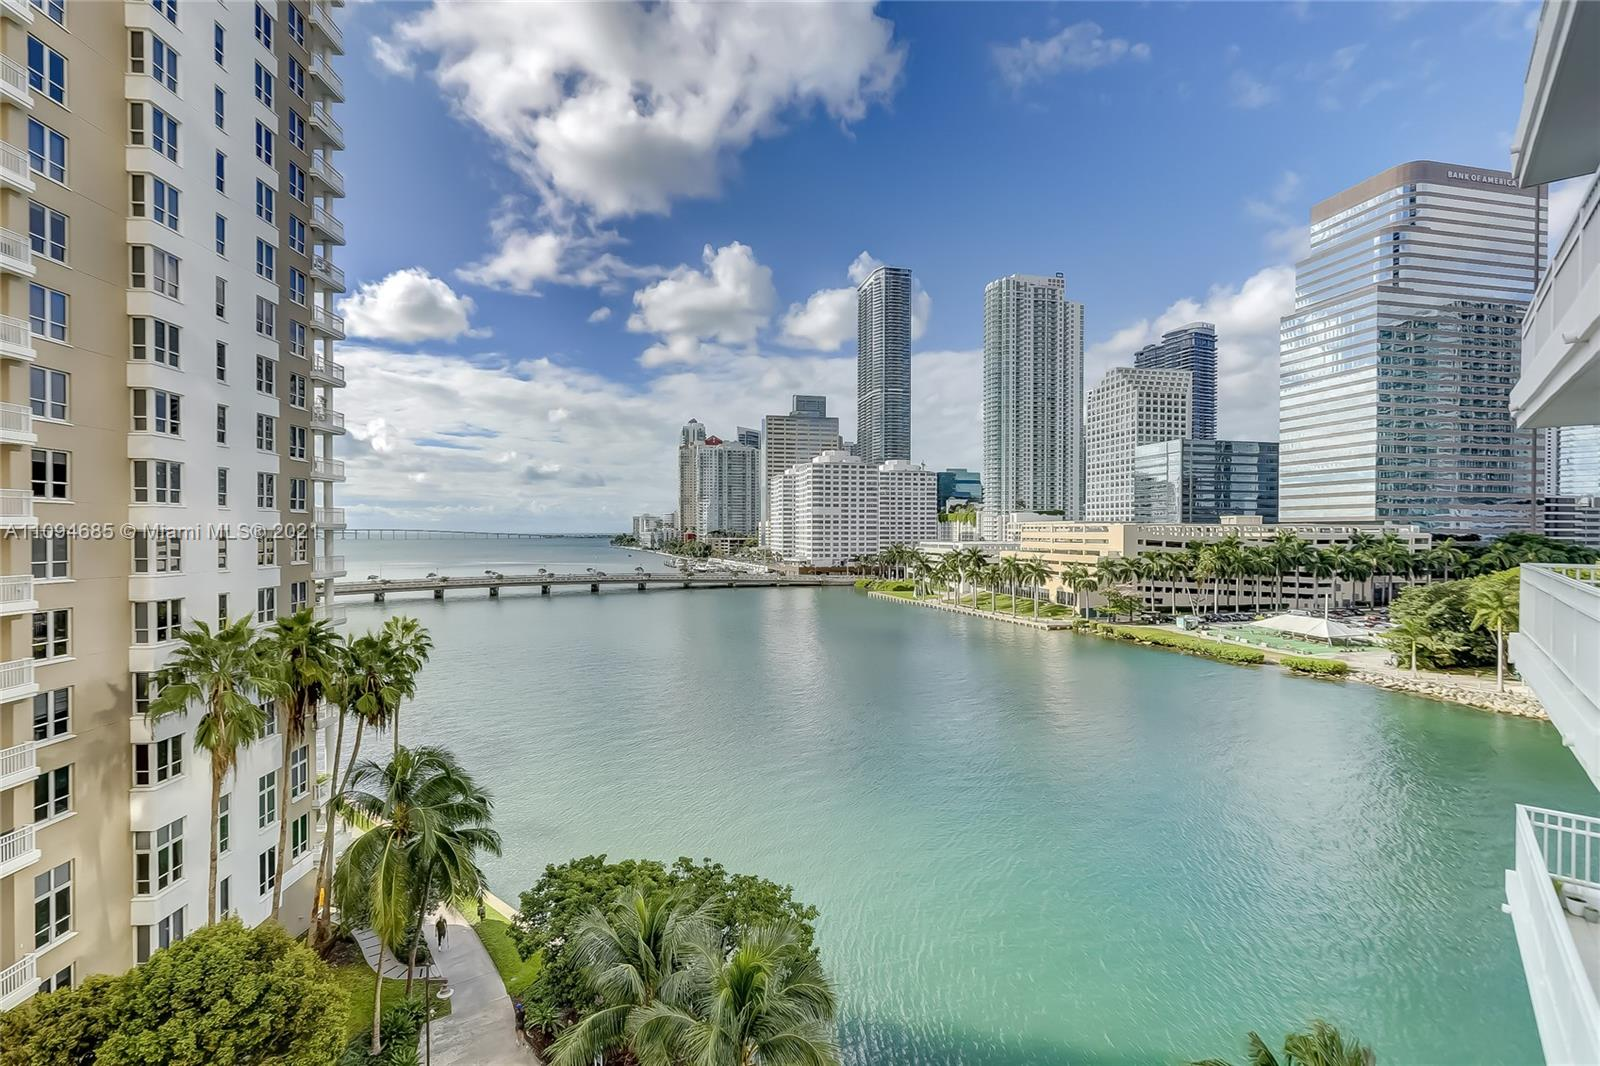 Courts Brickell Key #703 - 801 Brickell Key Blvd #703, Miami, FL 33131